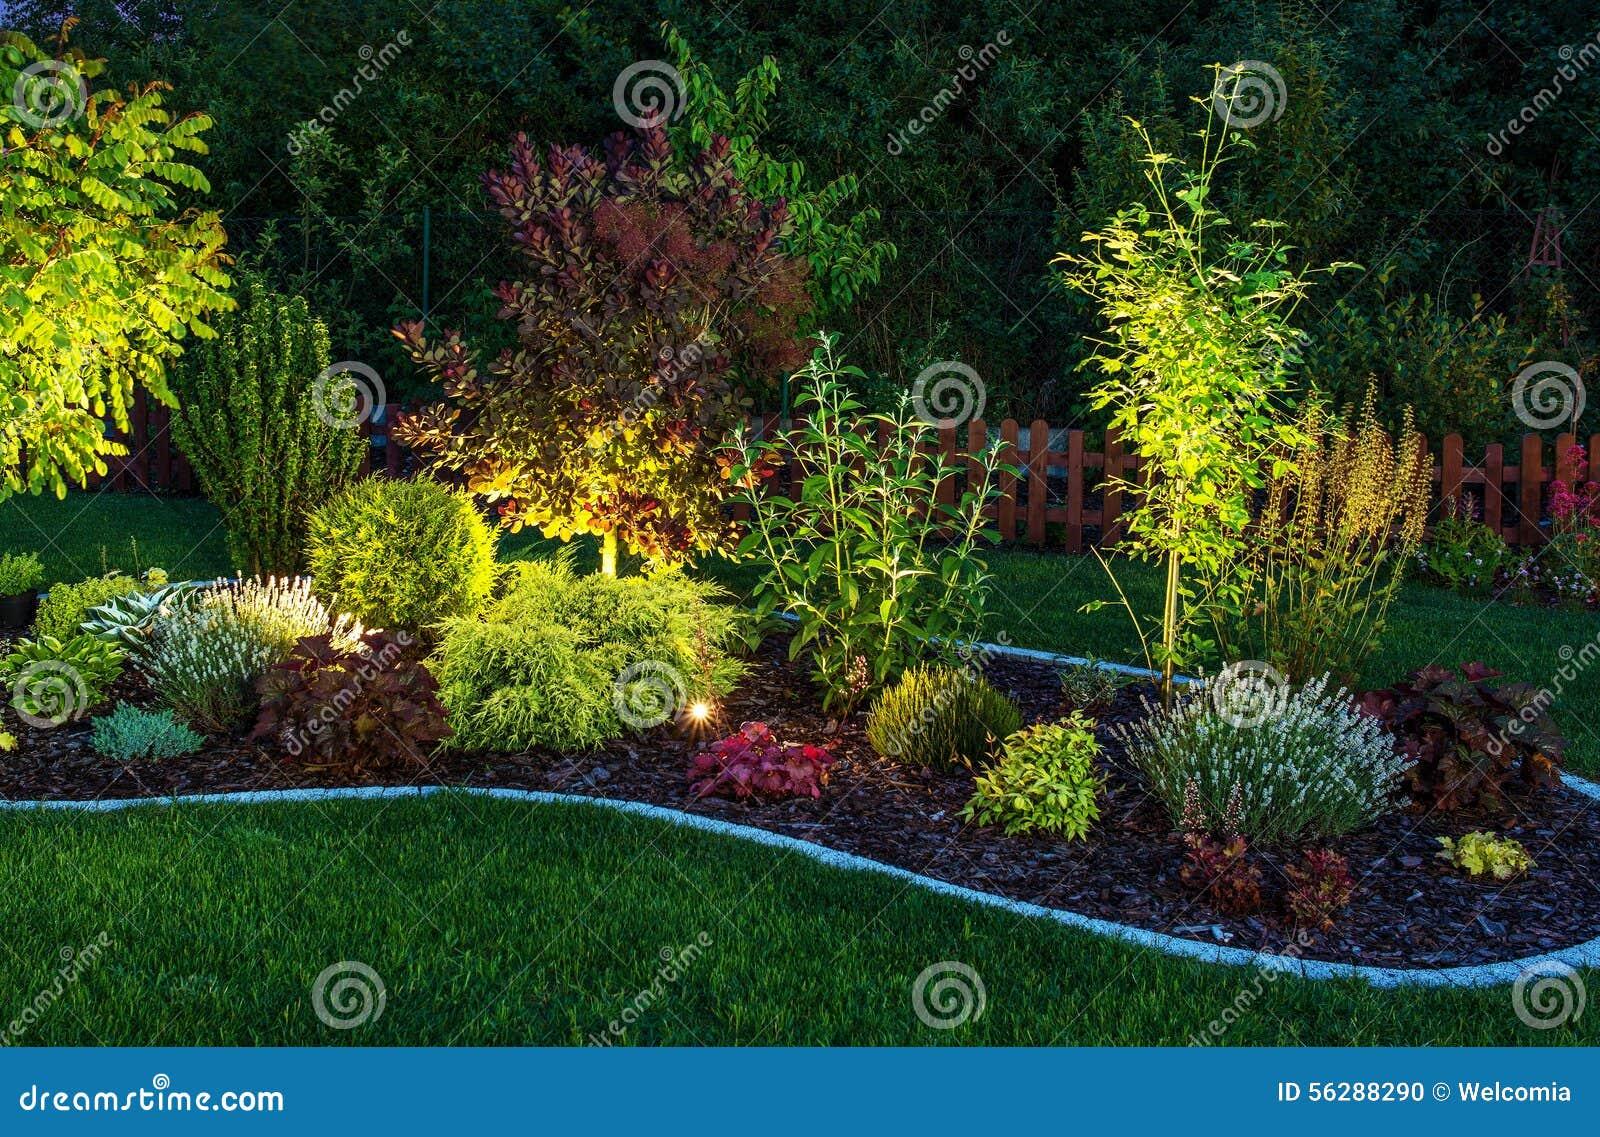 Download Illuminated Garden stock photo. Image of nature, blossom - 56288290